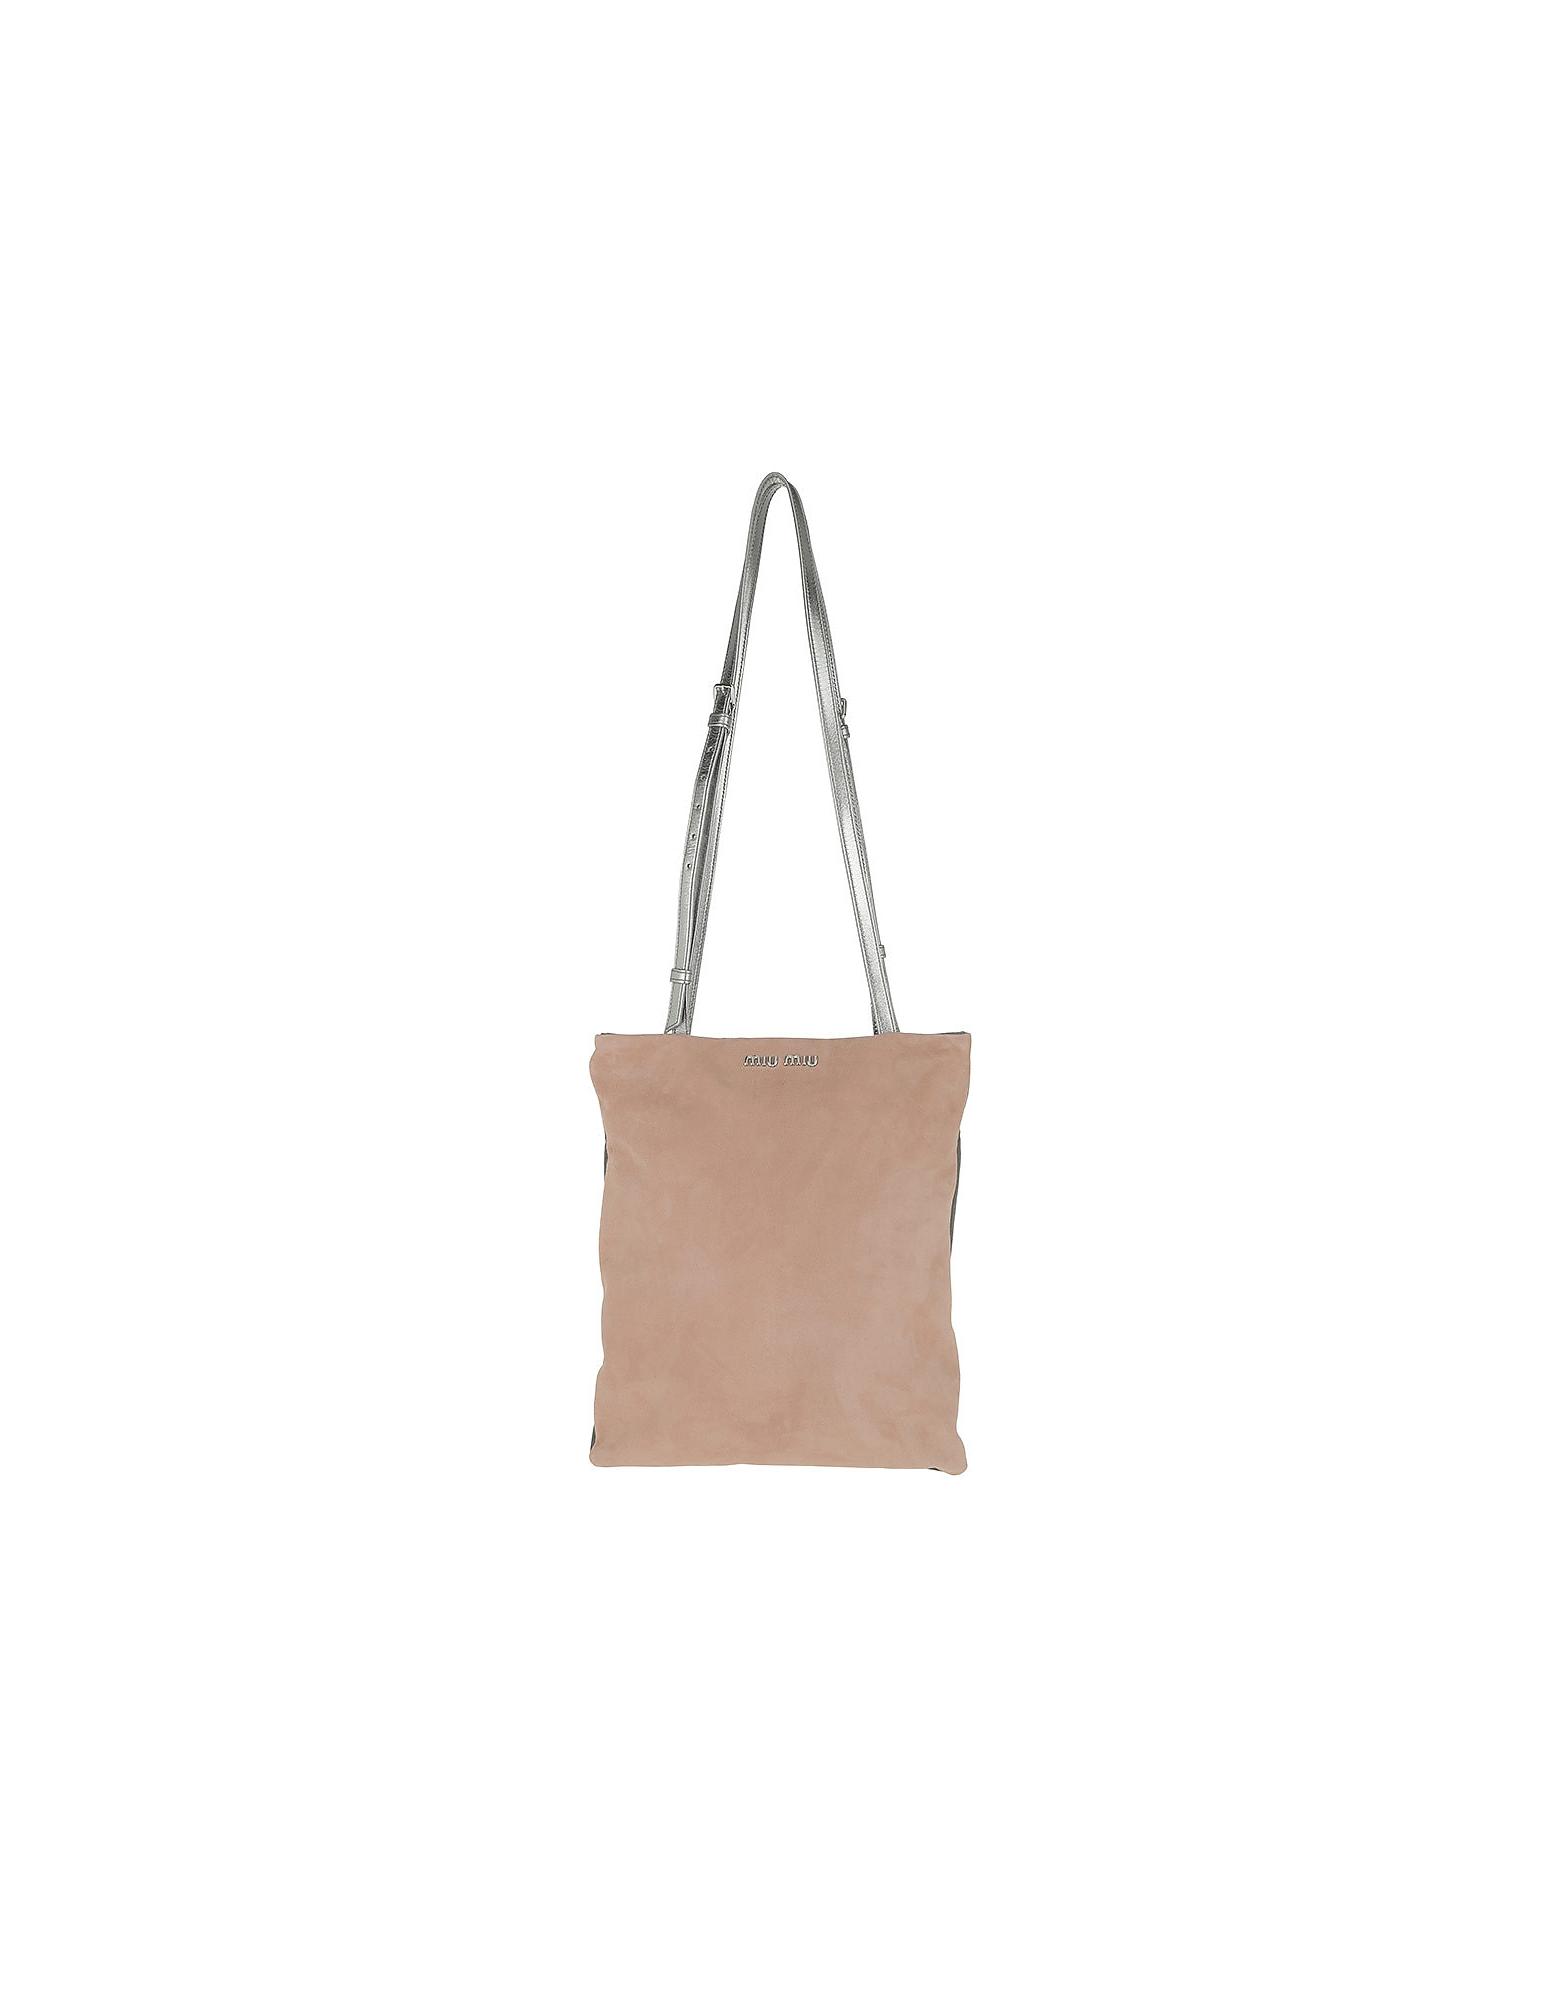 Miu Miu Handbags, Satin Lining Tote Suede Nudo/Ghiaia